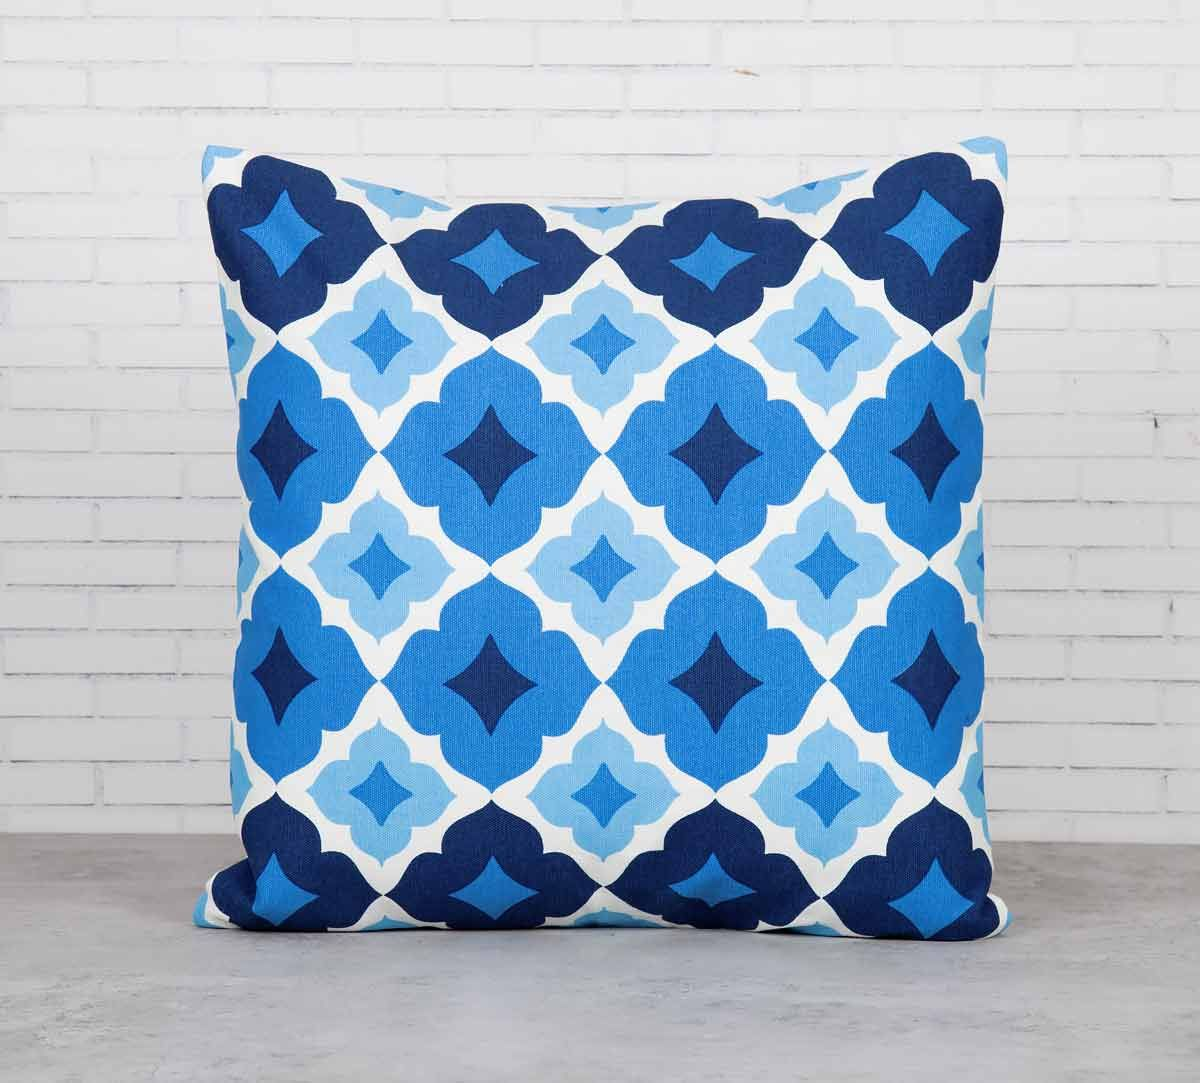 India Circus Ultramarine Tracery Sapphire Cotton Cushion Cover